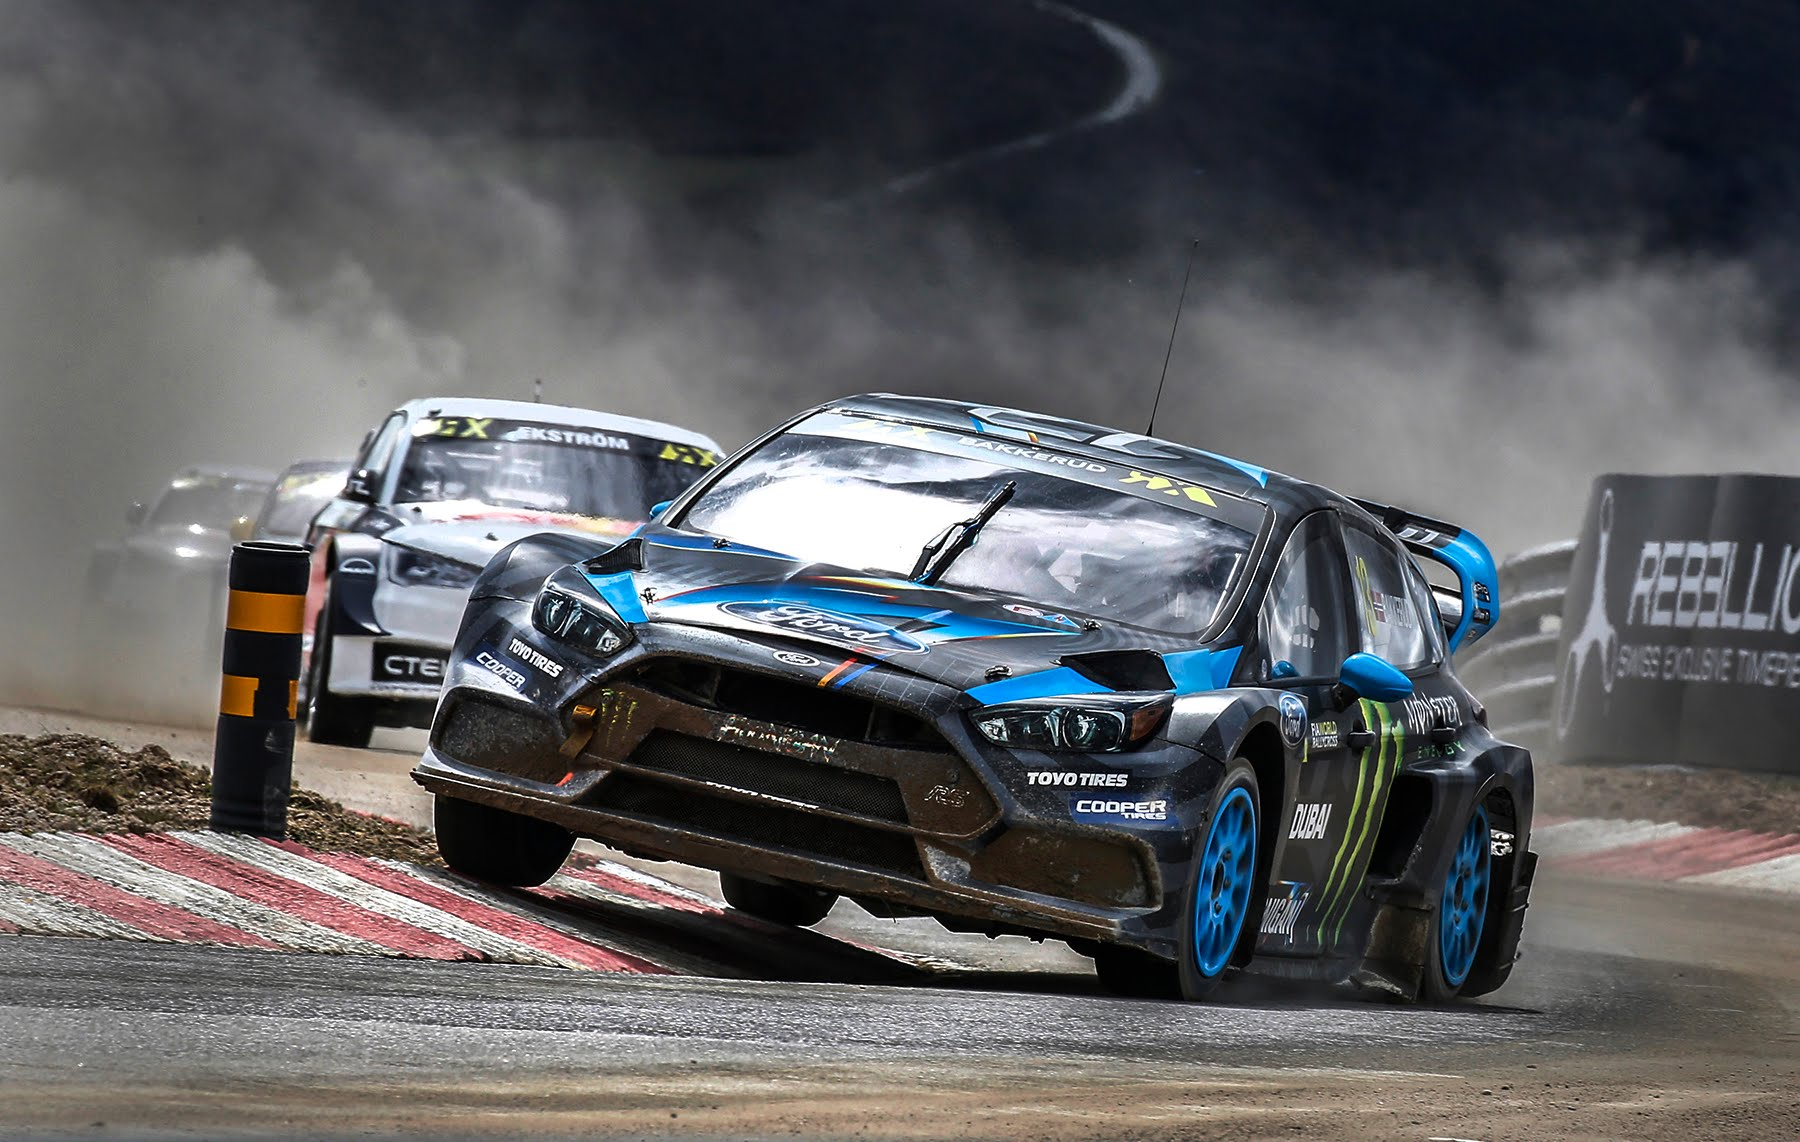 Mondiale Rallycross: tutti ad Hockenheim per scalzare Ekstrom dal trono